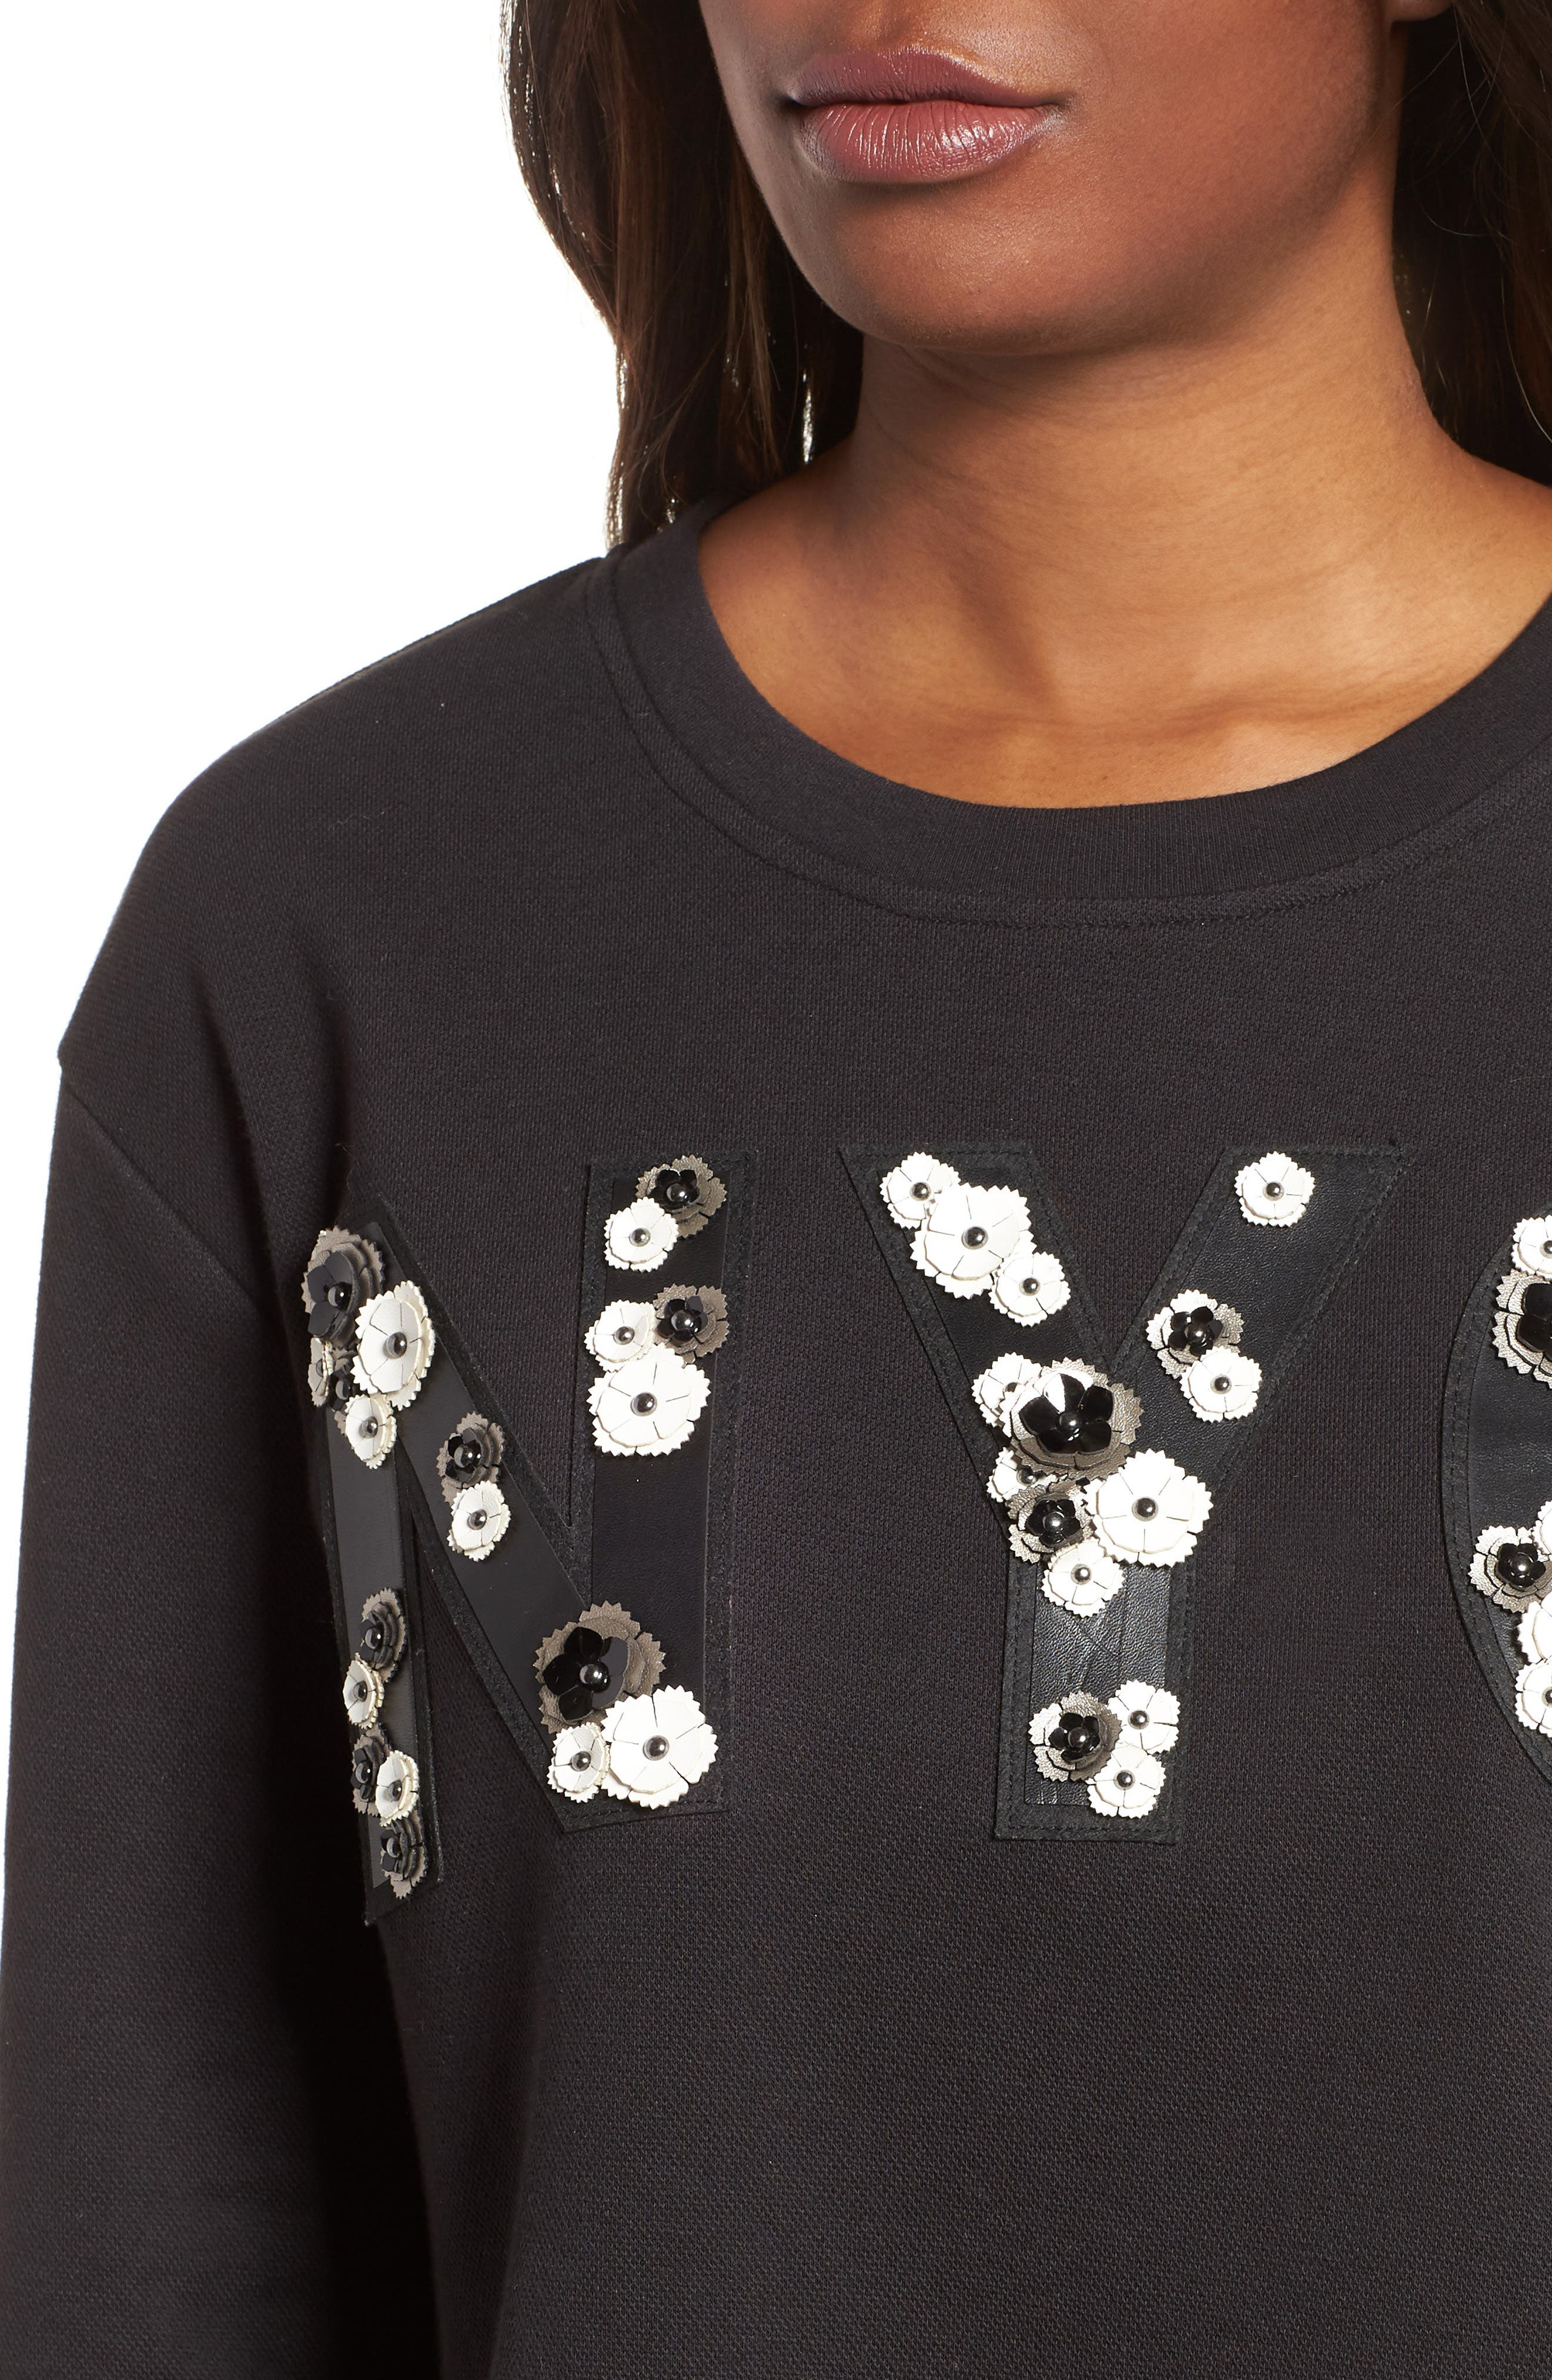 NYC Sweatshirt,                             Alternate thumbnail 4, color,                             BLACK